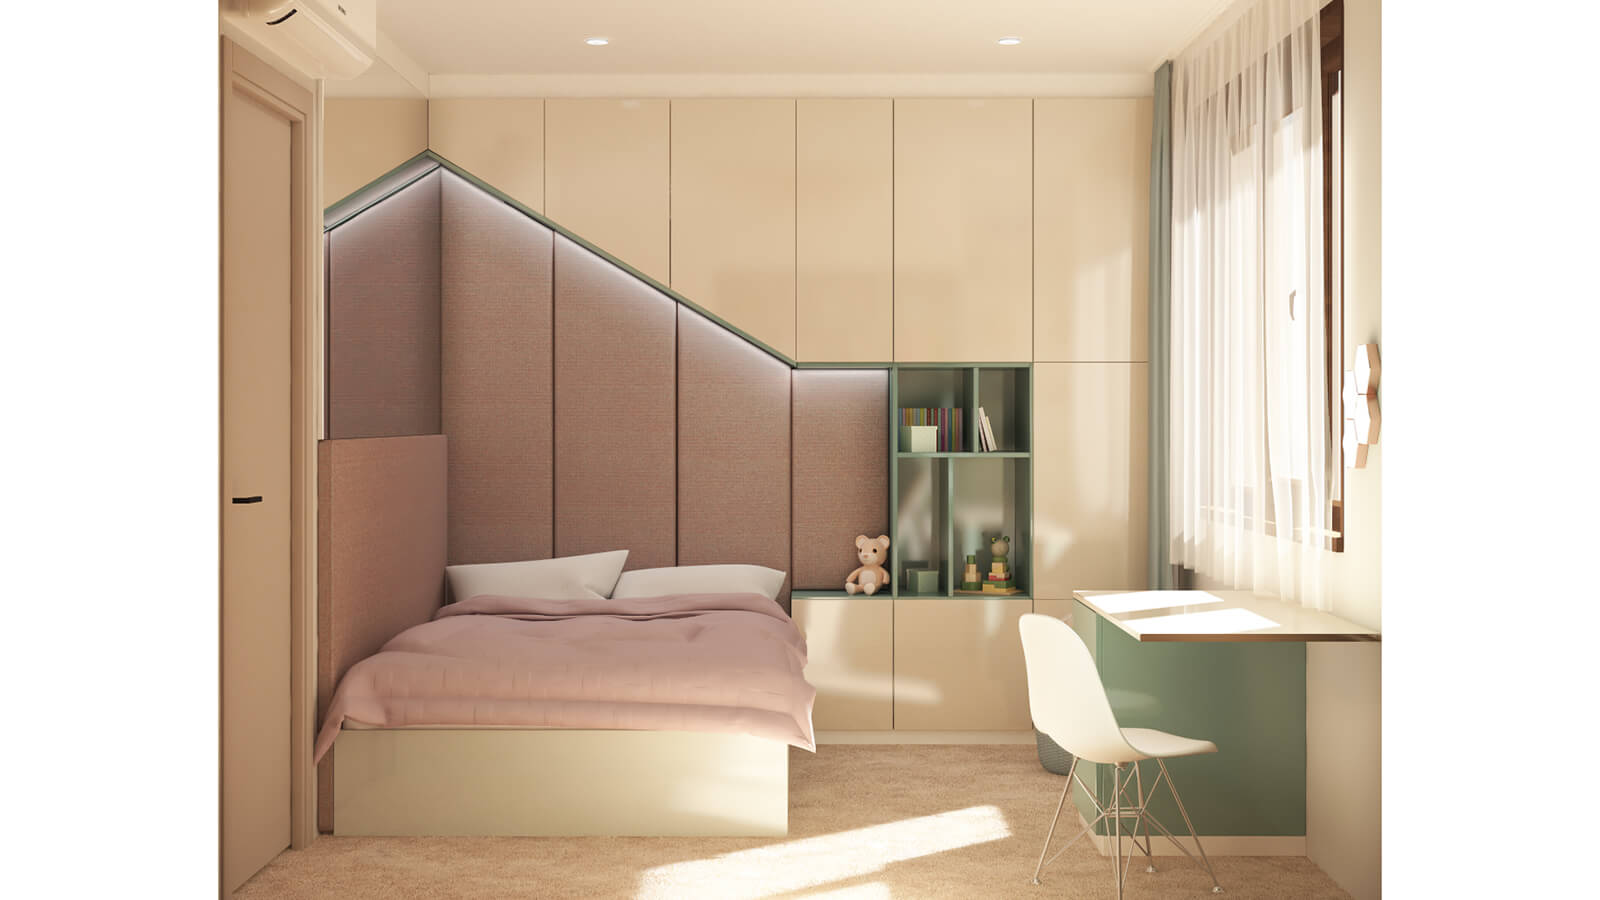 interioren-dizain-proekt-luciano (12)